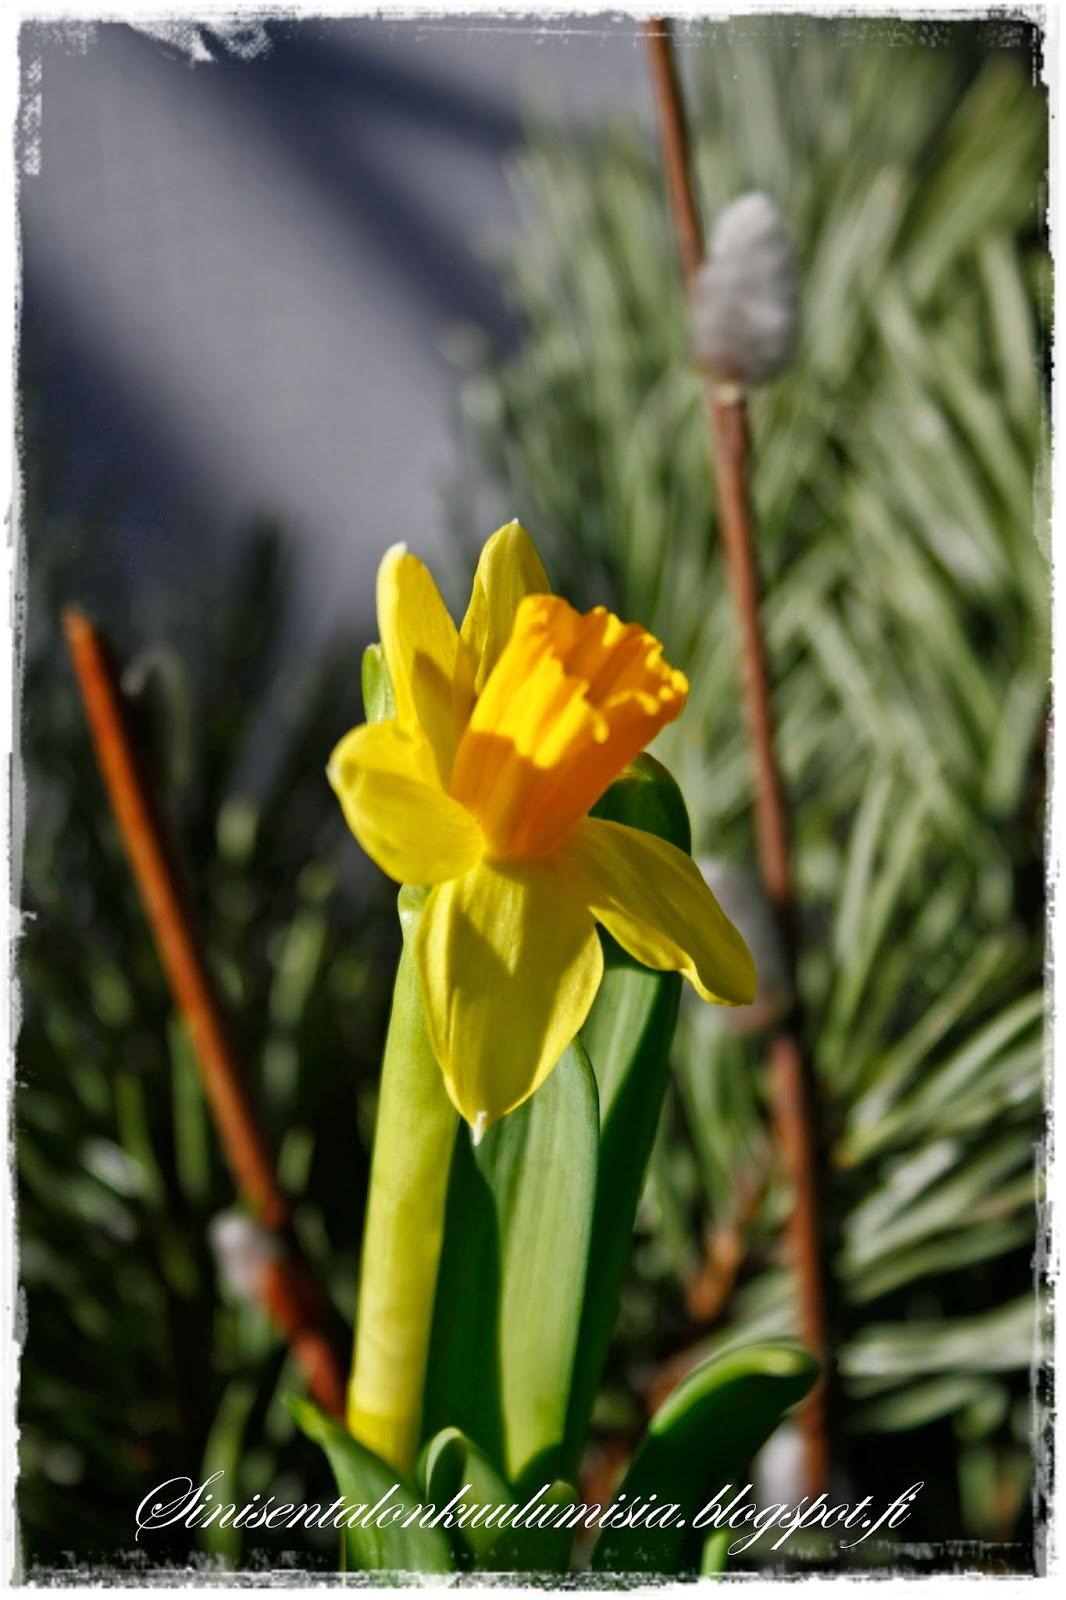 kevät kukat ulos